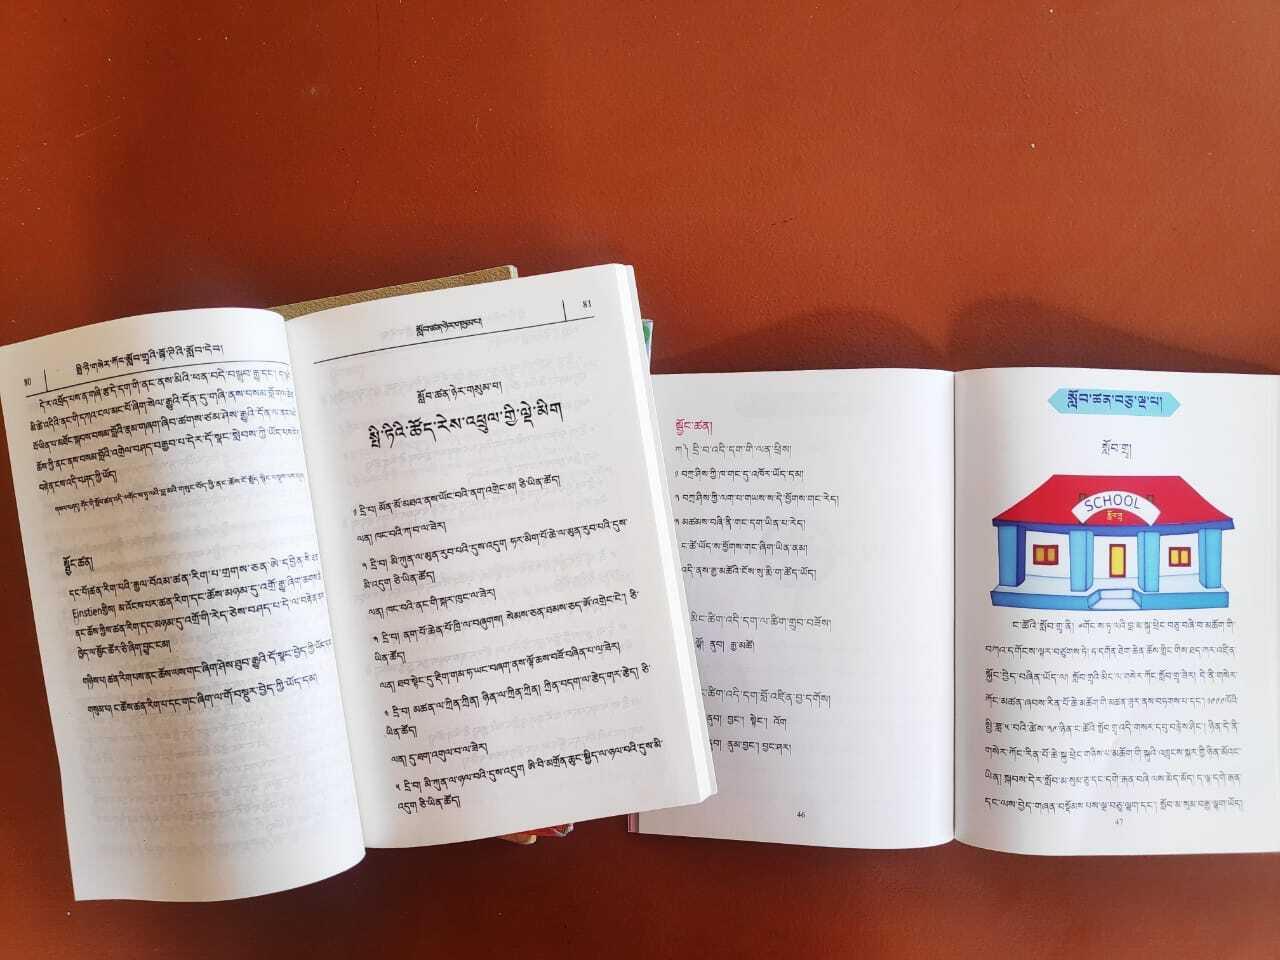 Serkon gSchool's Bothi language books - Photo by Venerable Padma Chottar